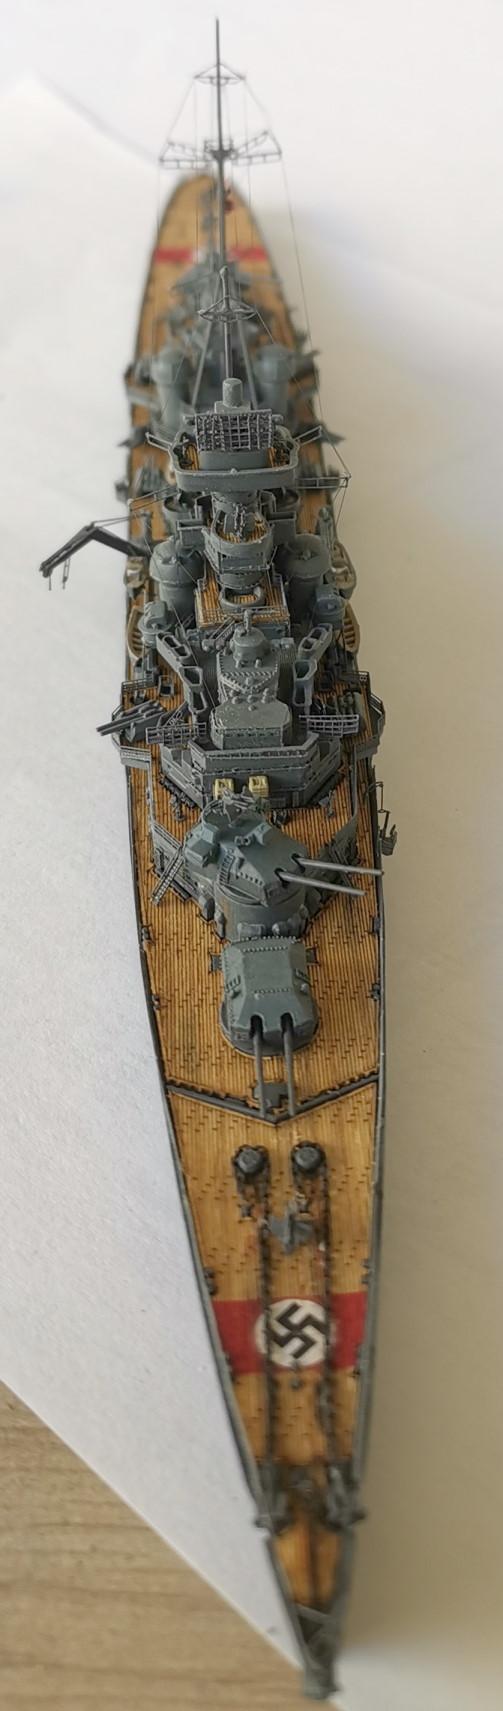 Prinz Eugen 1/700e Trumpeter + kit Flyhawk et pont en bois Prinz016